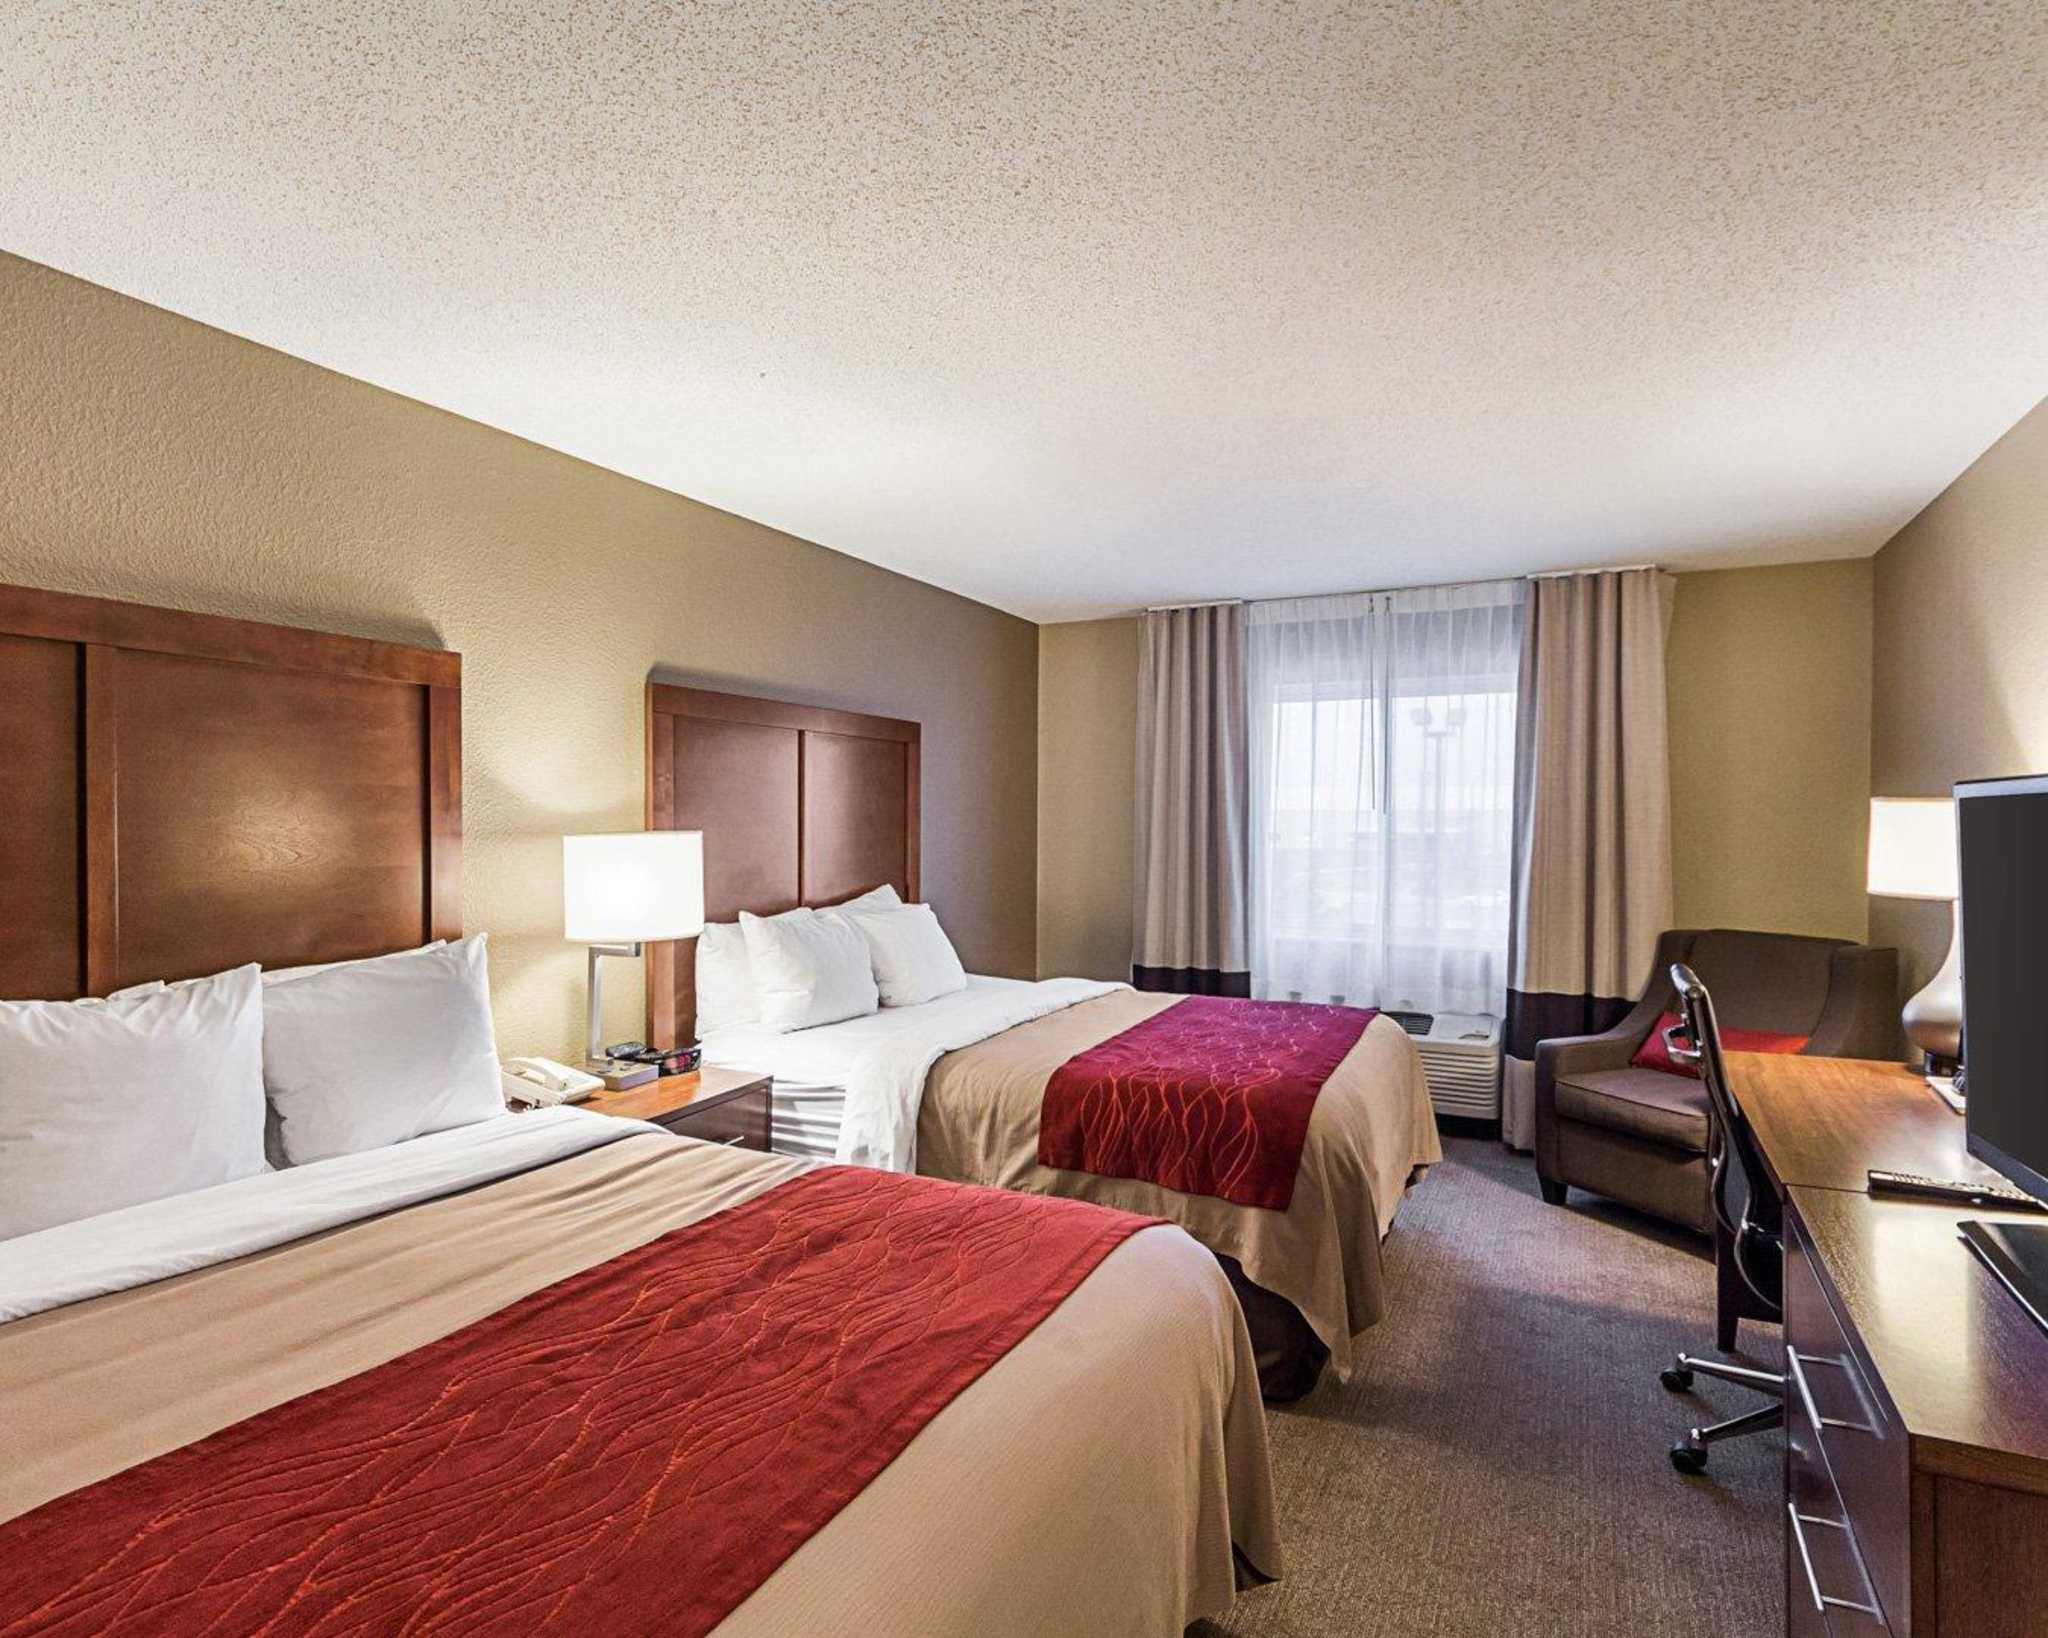 Comfort Inn East image 6